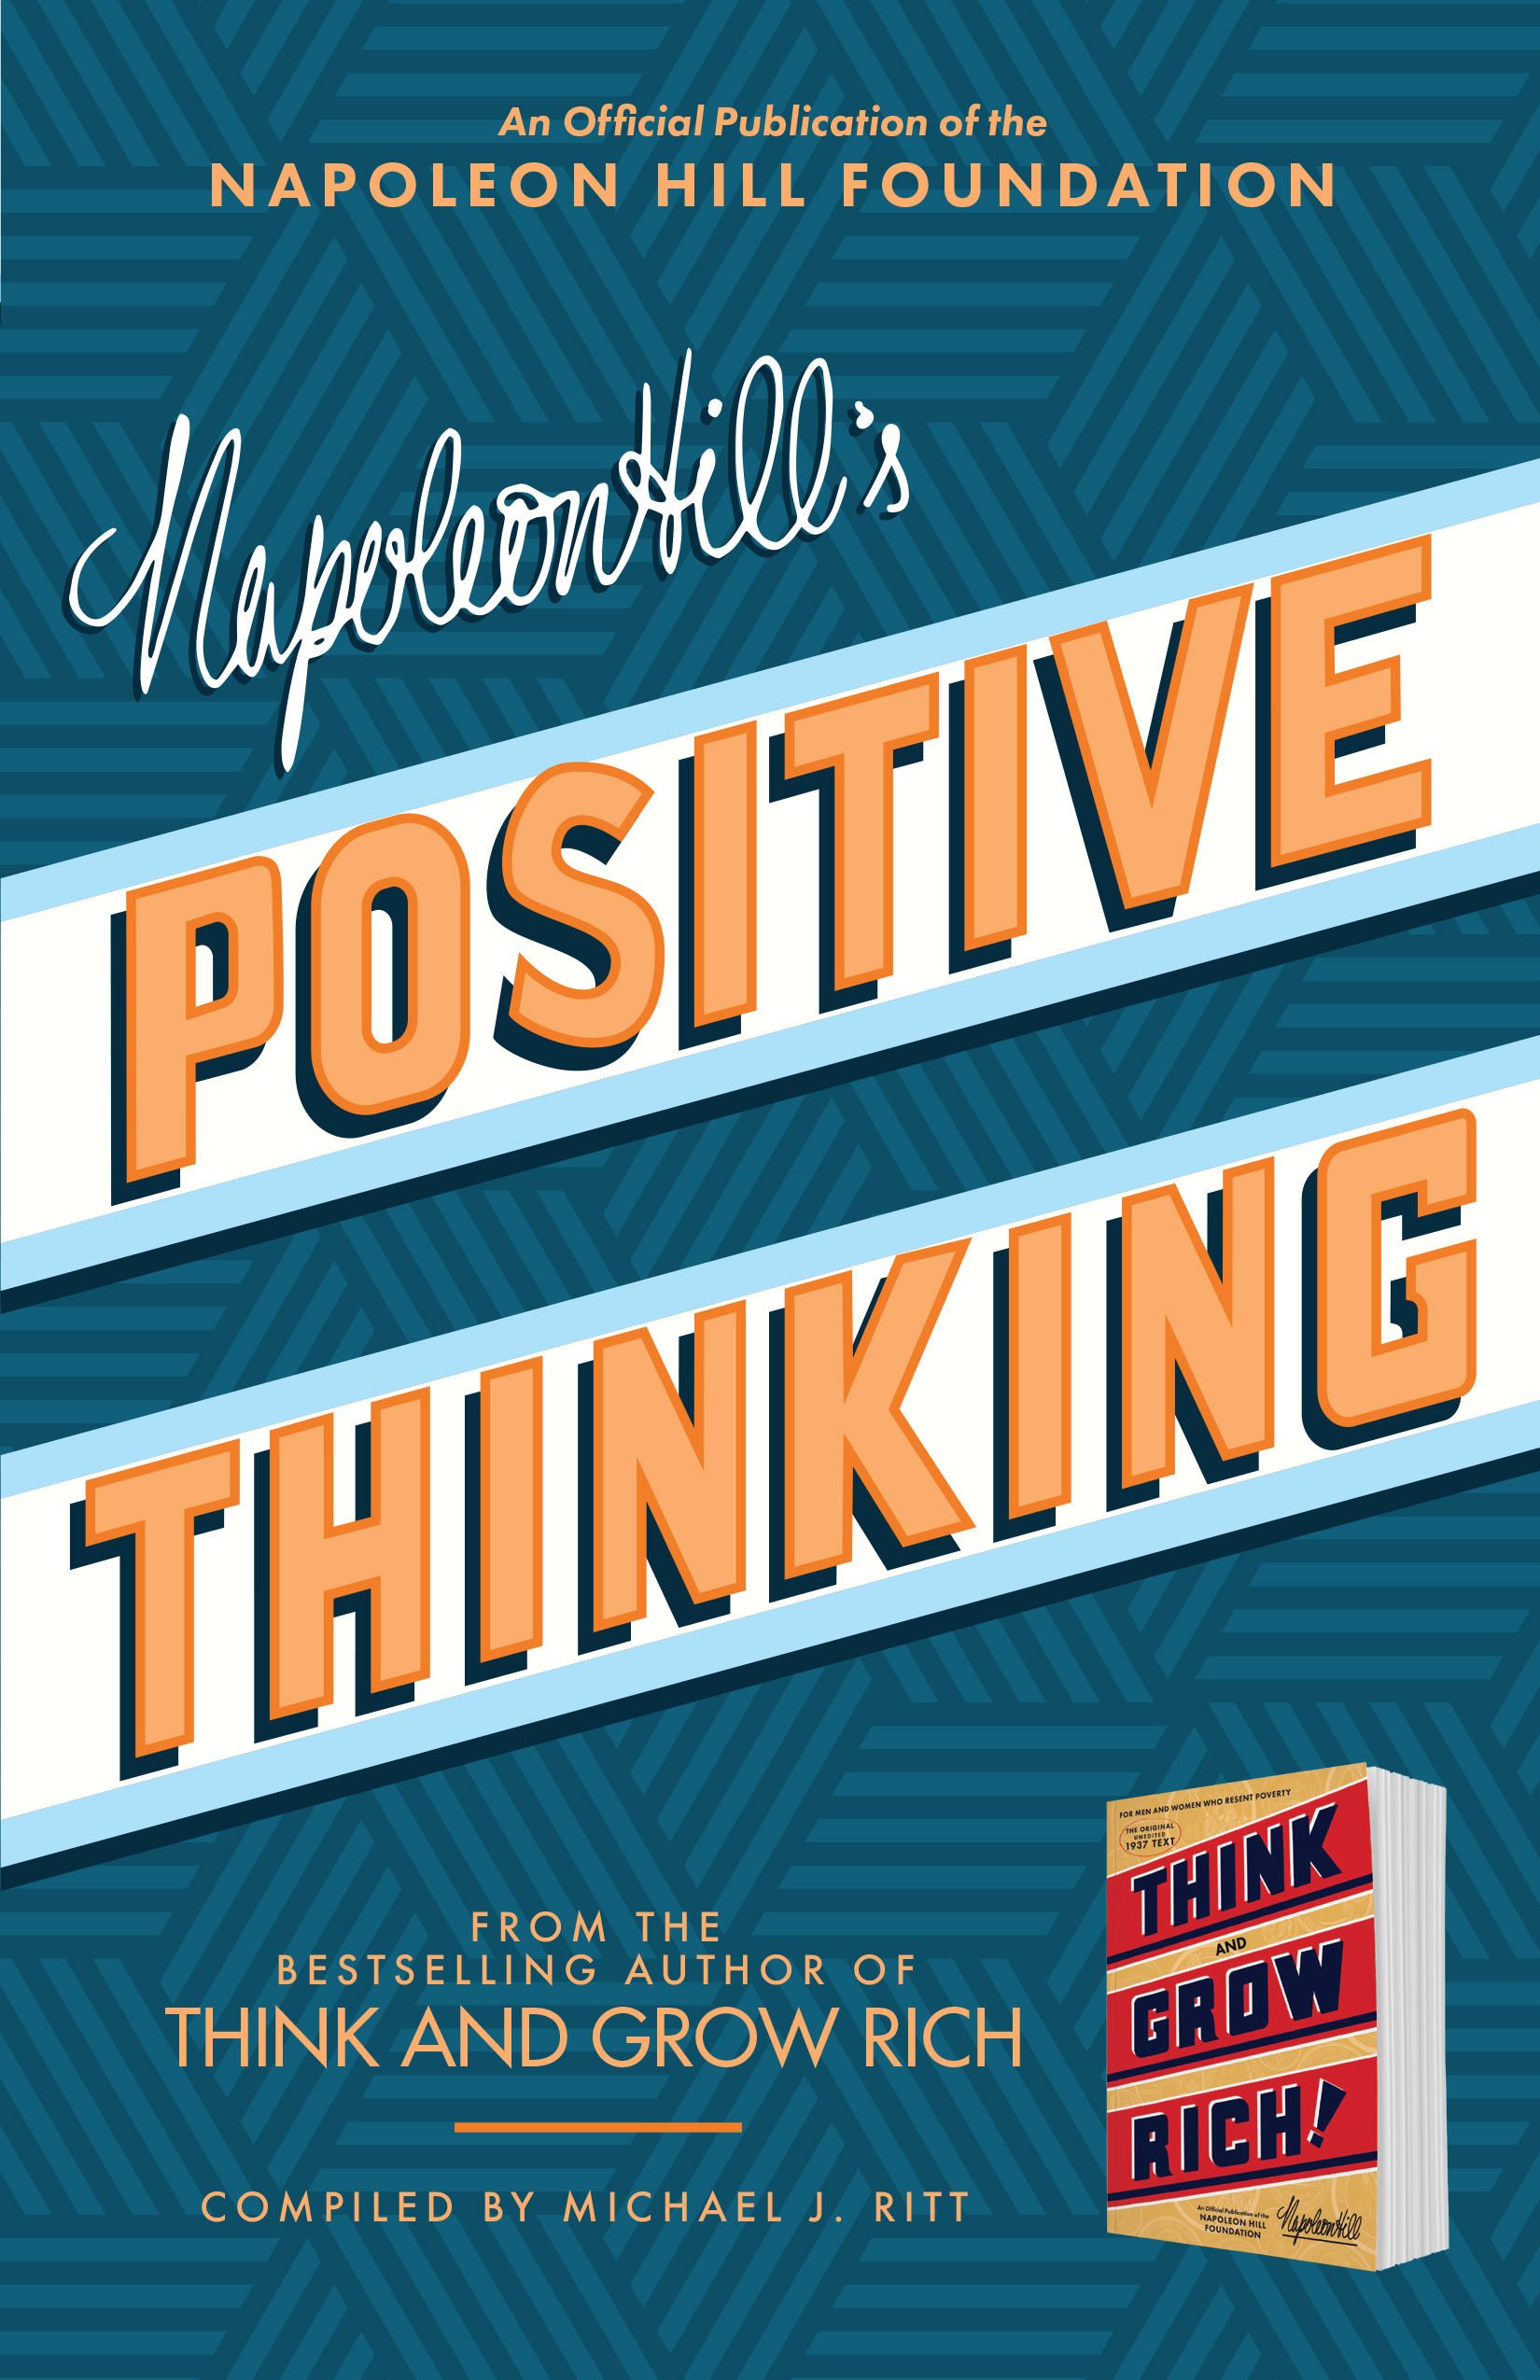 Napoleon Hill's Positive Thinking - By Napoleon Hill